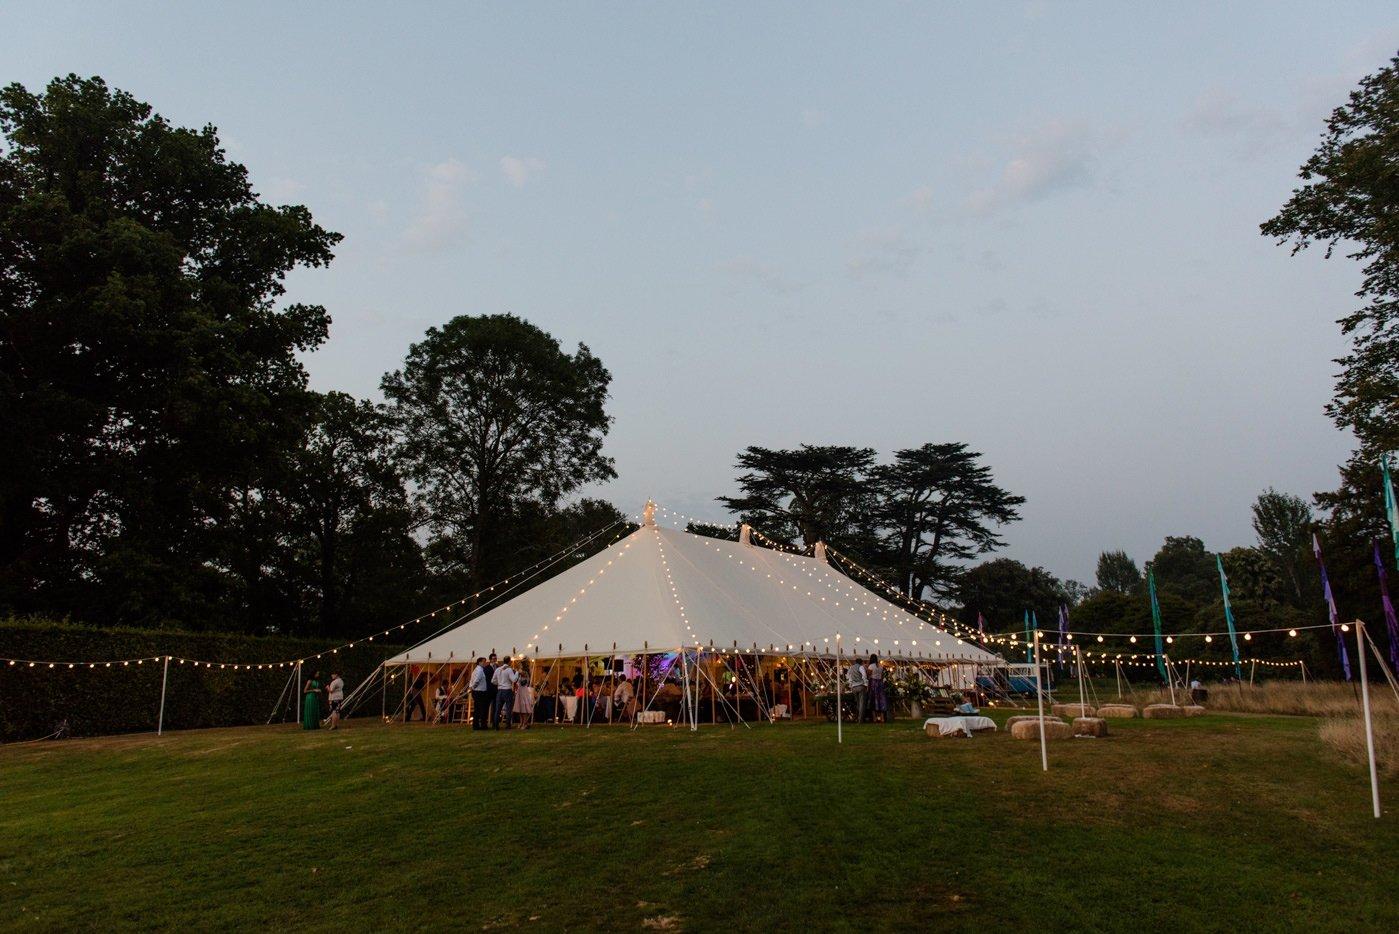 bignor-park-wedding-photography-robyn-and-tom-110